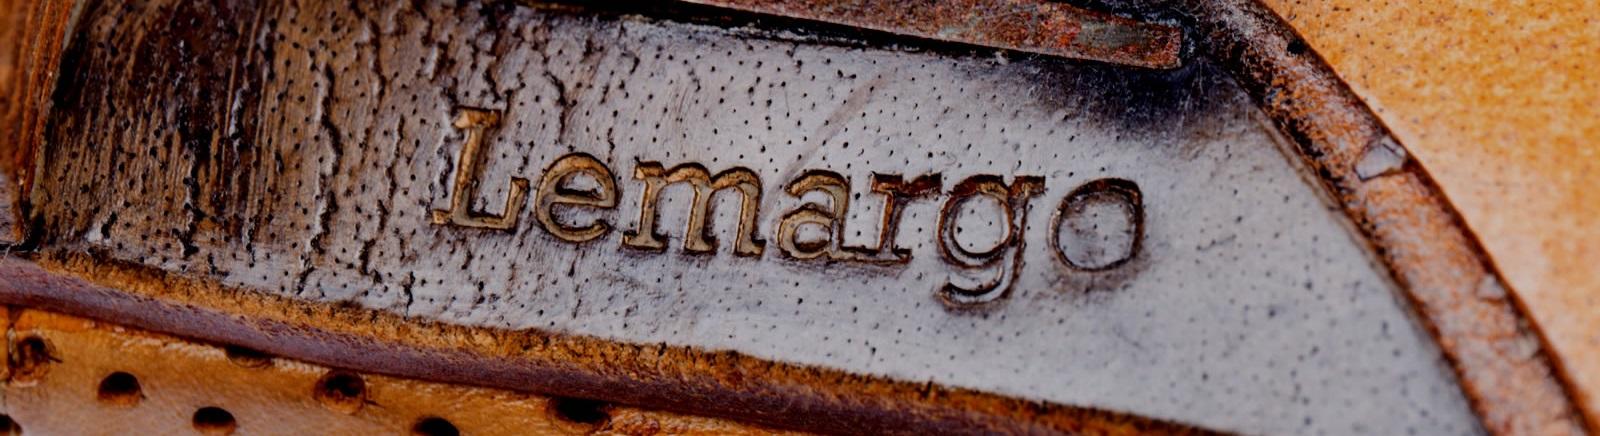 Prange: Lemargo Herren Boots online shoppen